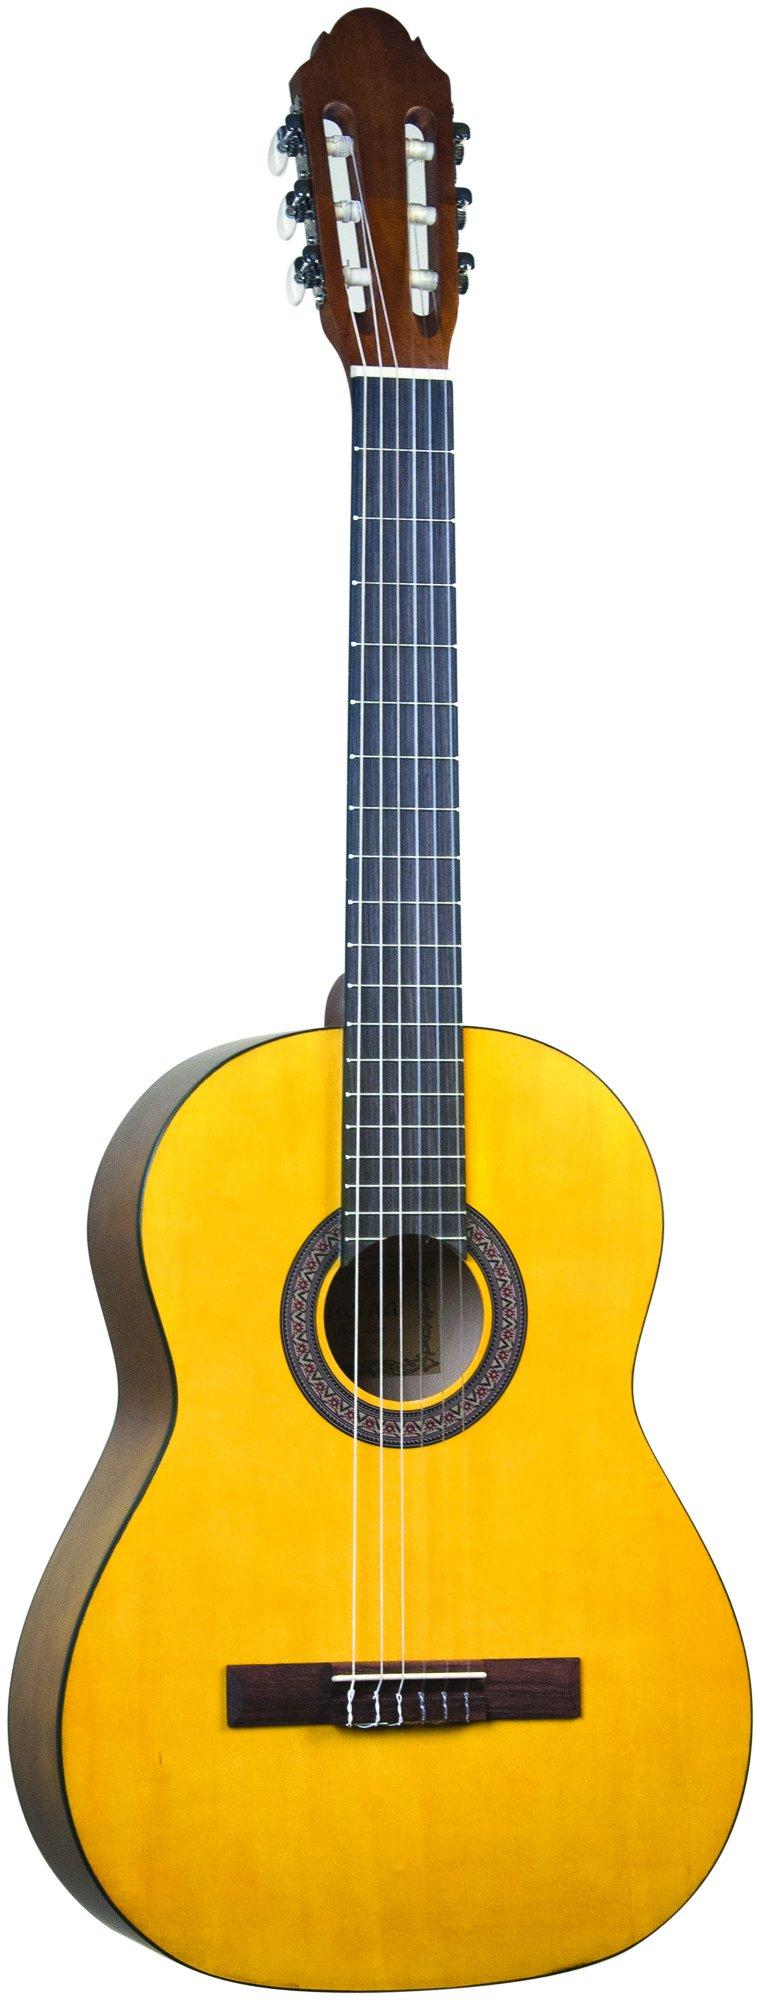 Lucida LG-400-NA Student Classical Guitar, Natural